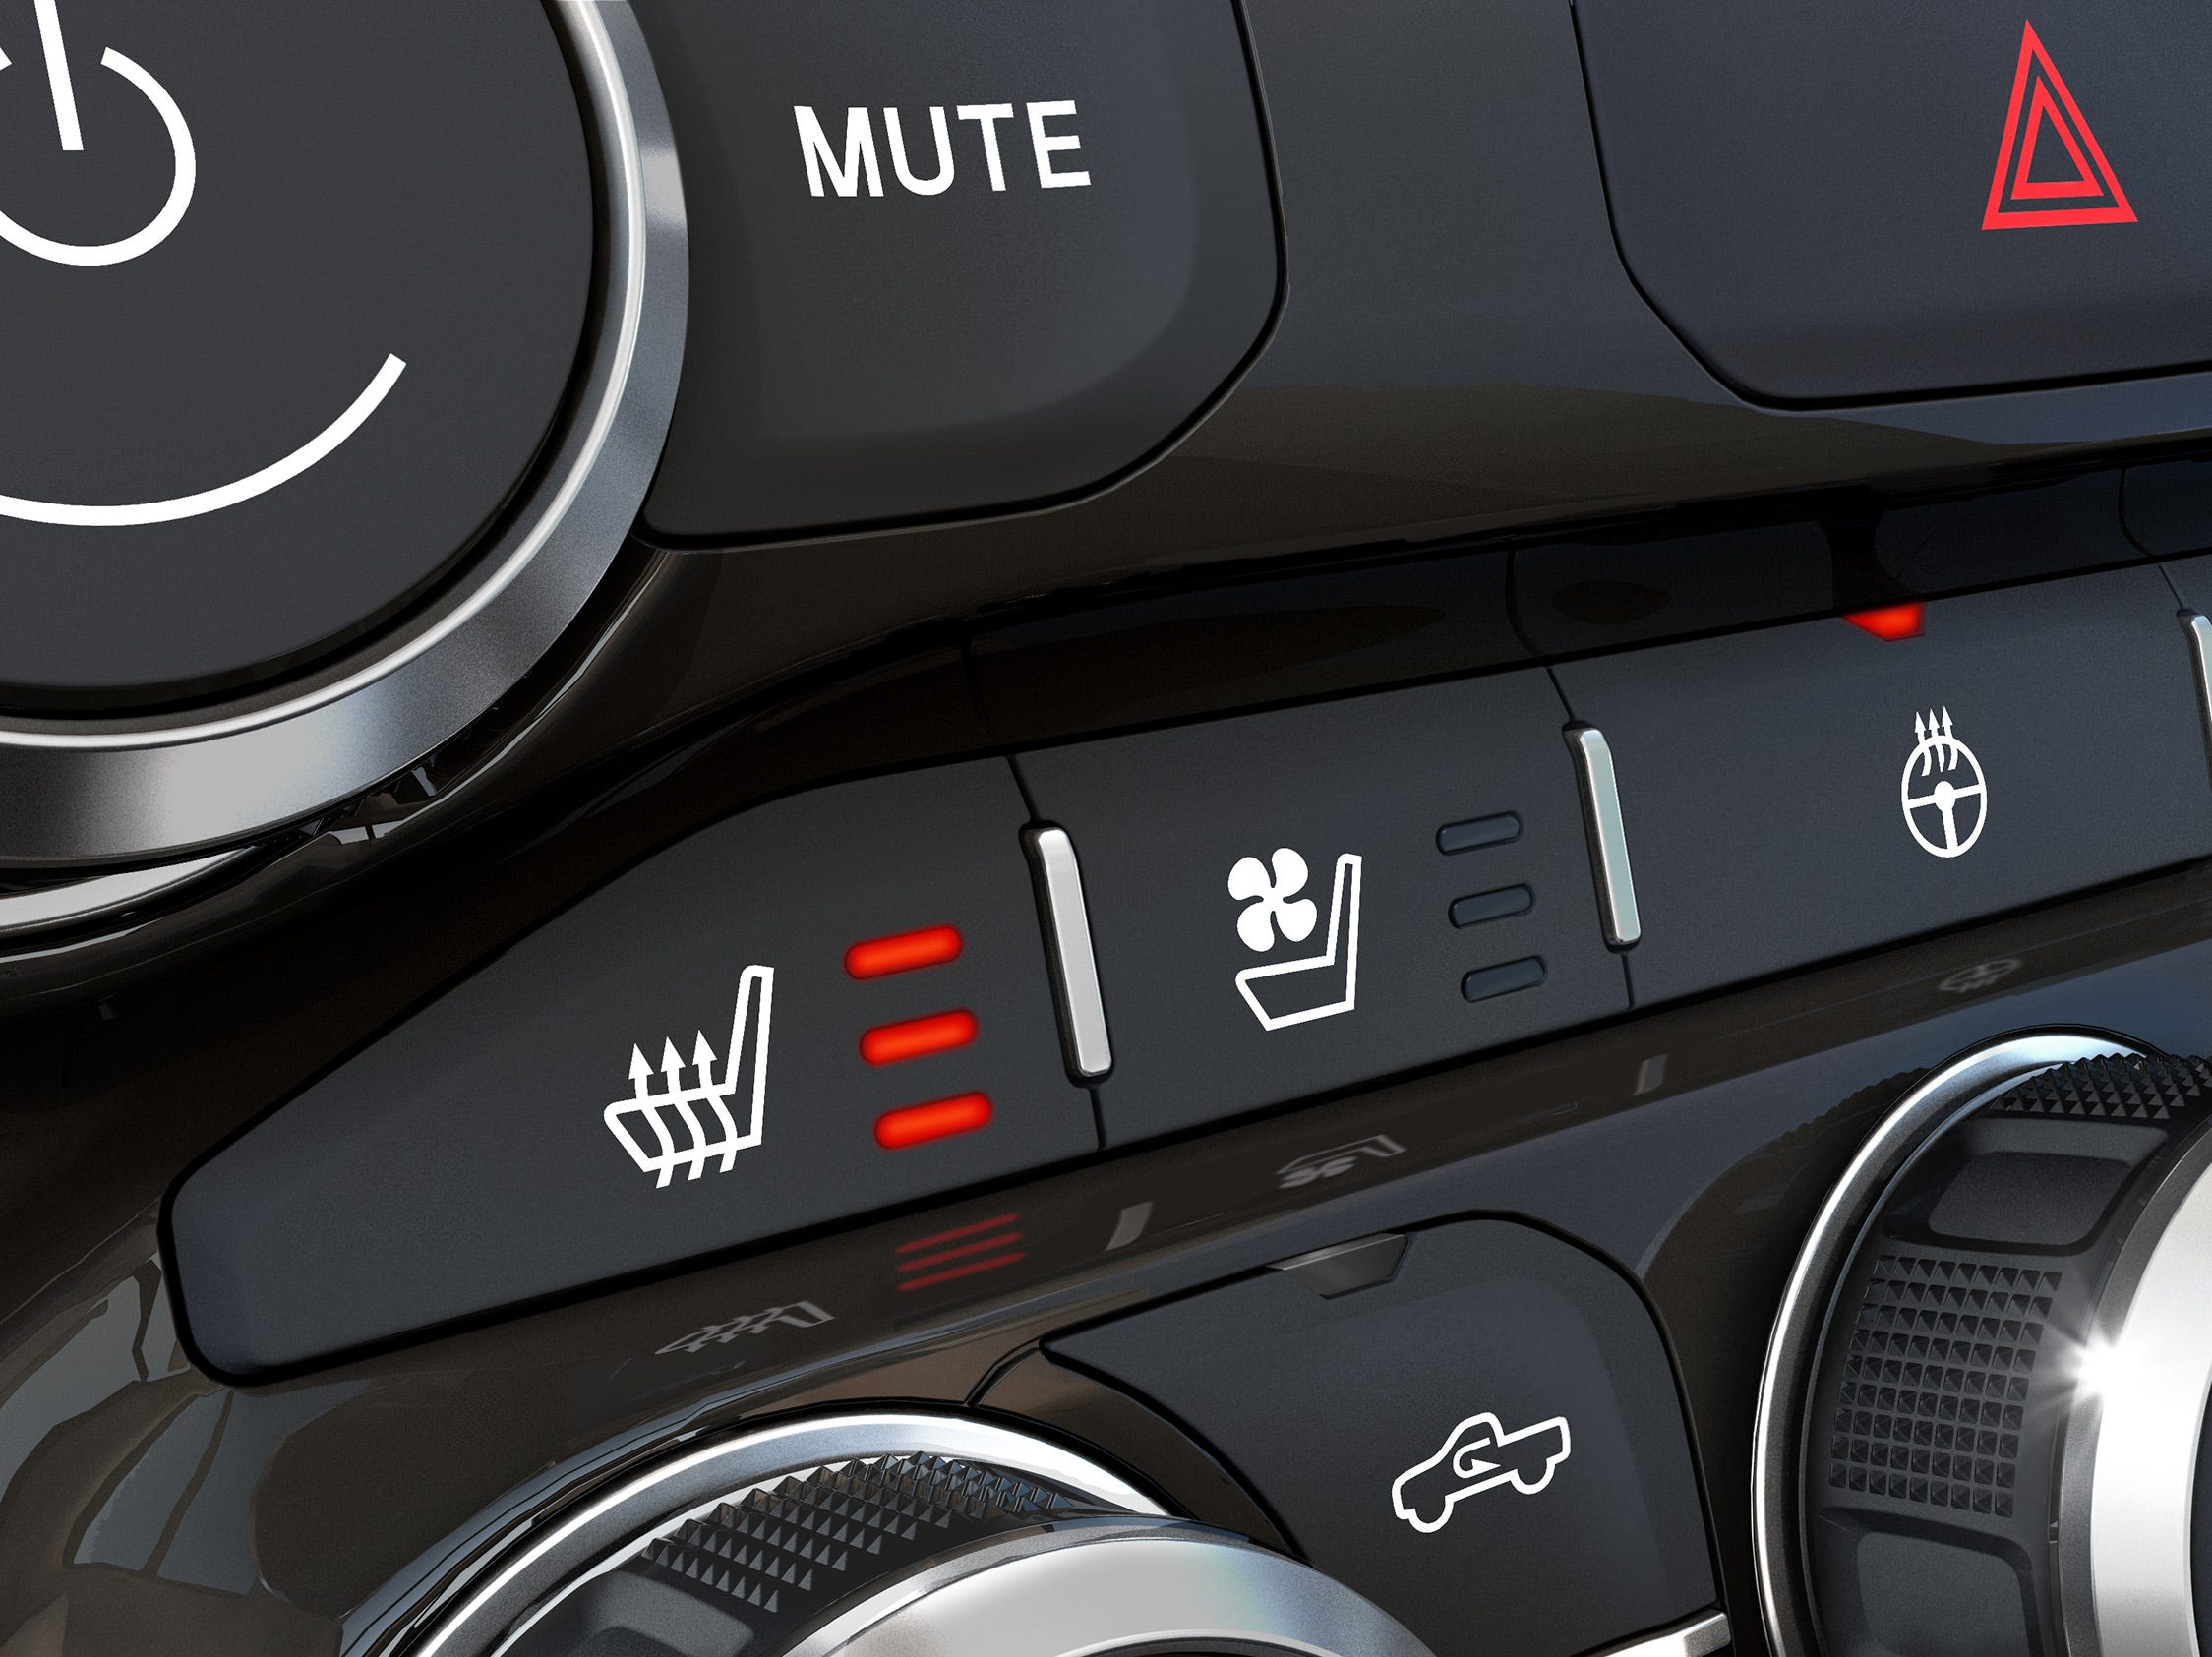 2019 Ram Heavy Duty heated seats and steering wheel